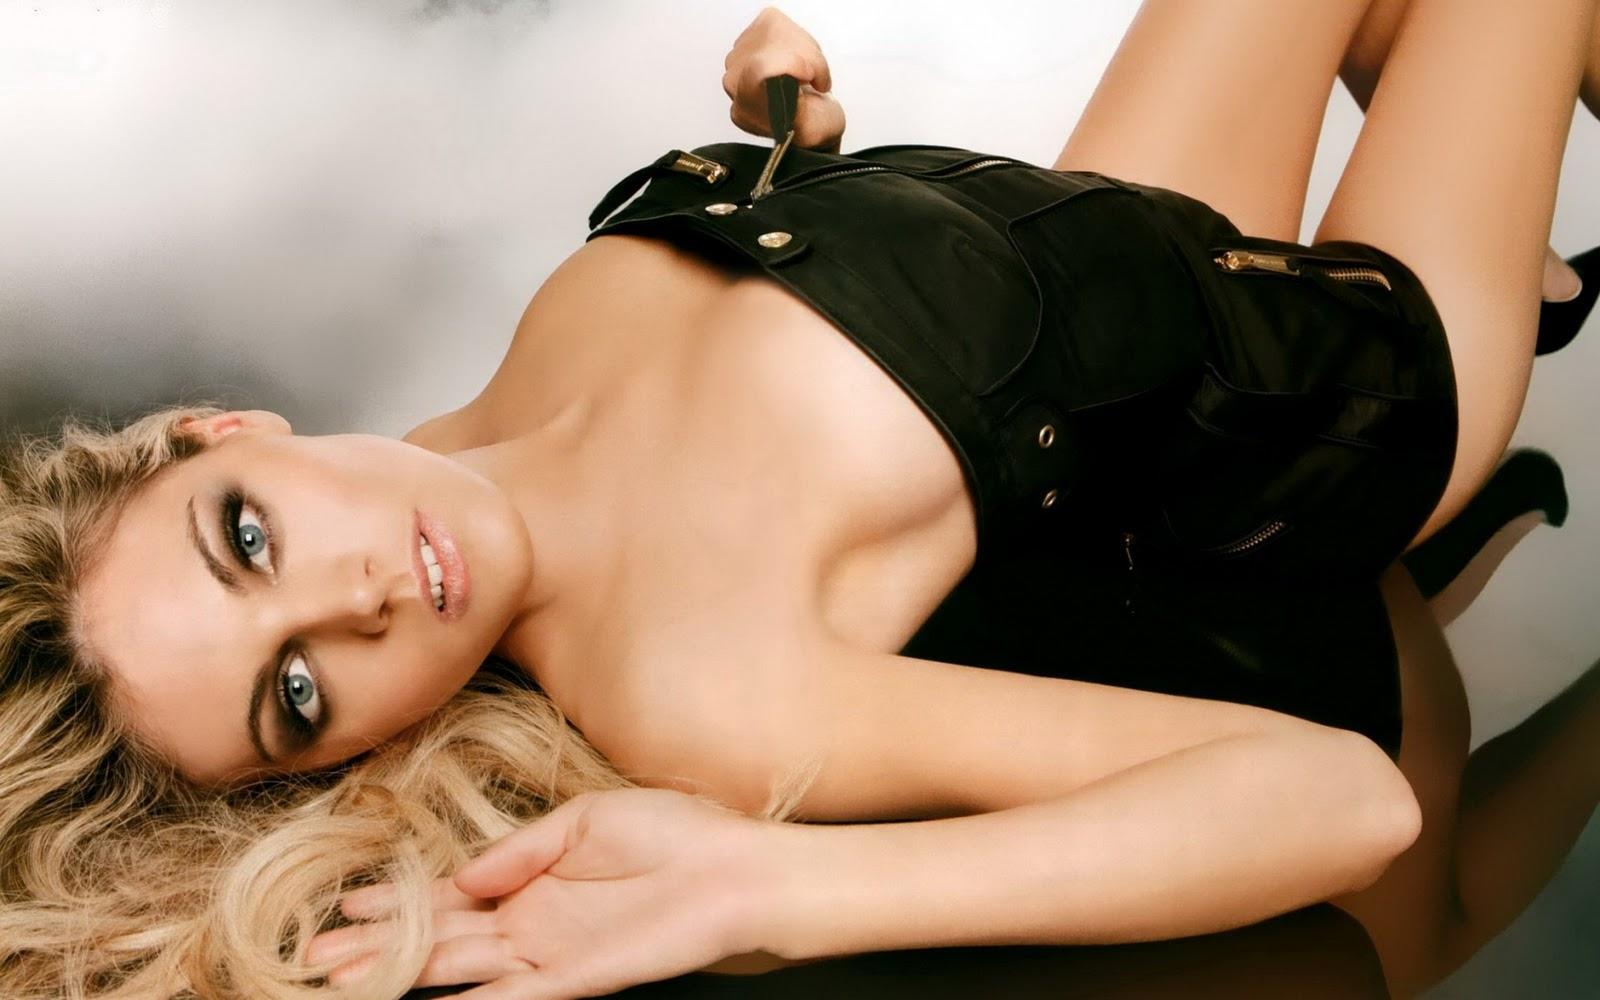 http://4.bp.blogspot.com/_NGf1jVqmCgw/TNL7Od1rMoI/AAAAAAAAADc/TJXr1-bxz50/s1600/amaia_salamanca_1920x1200_International_Model_Sexy_Wallpaper.jpg